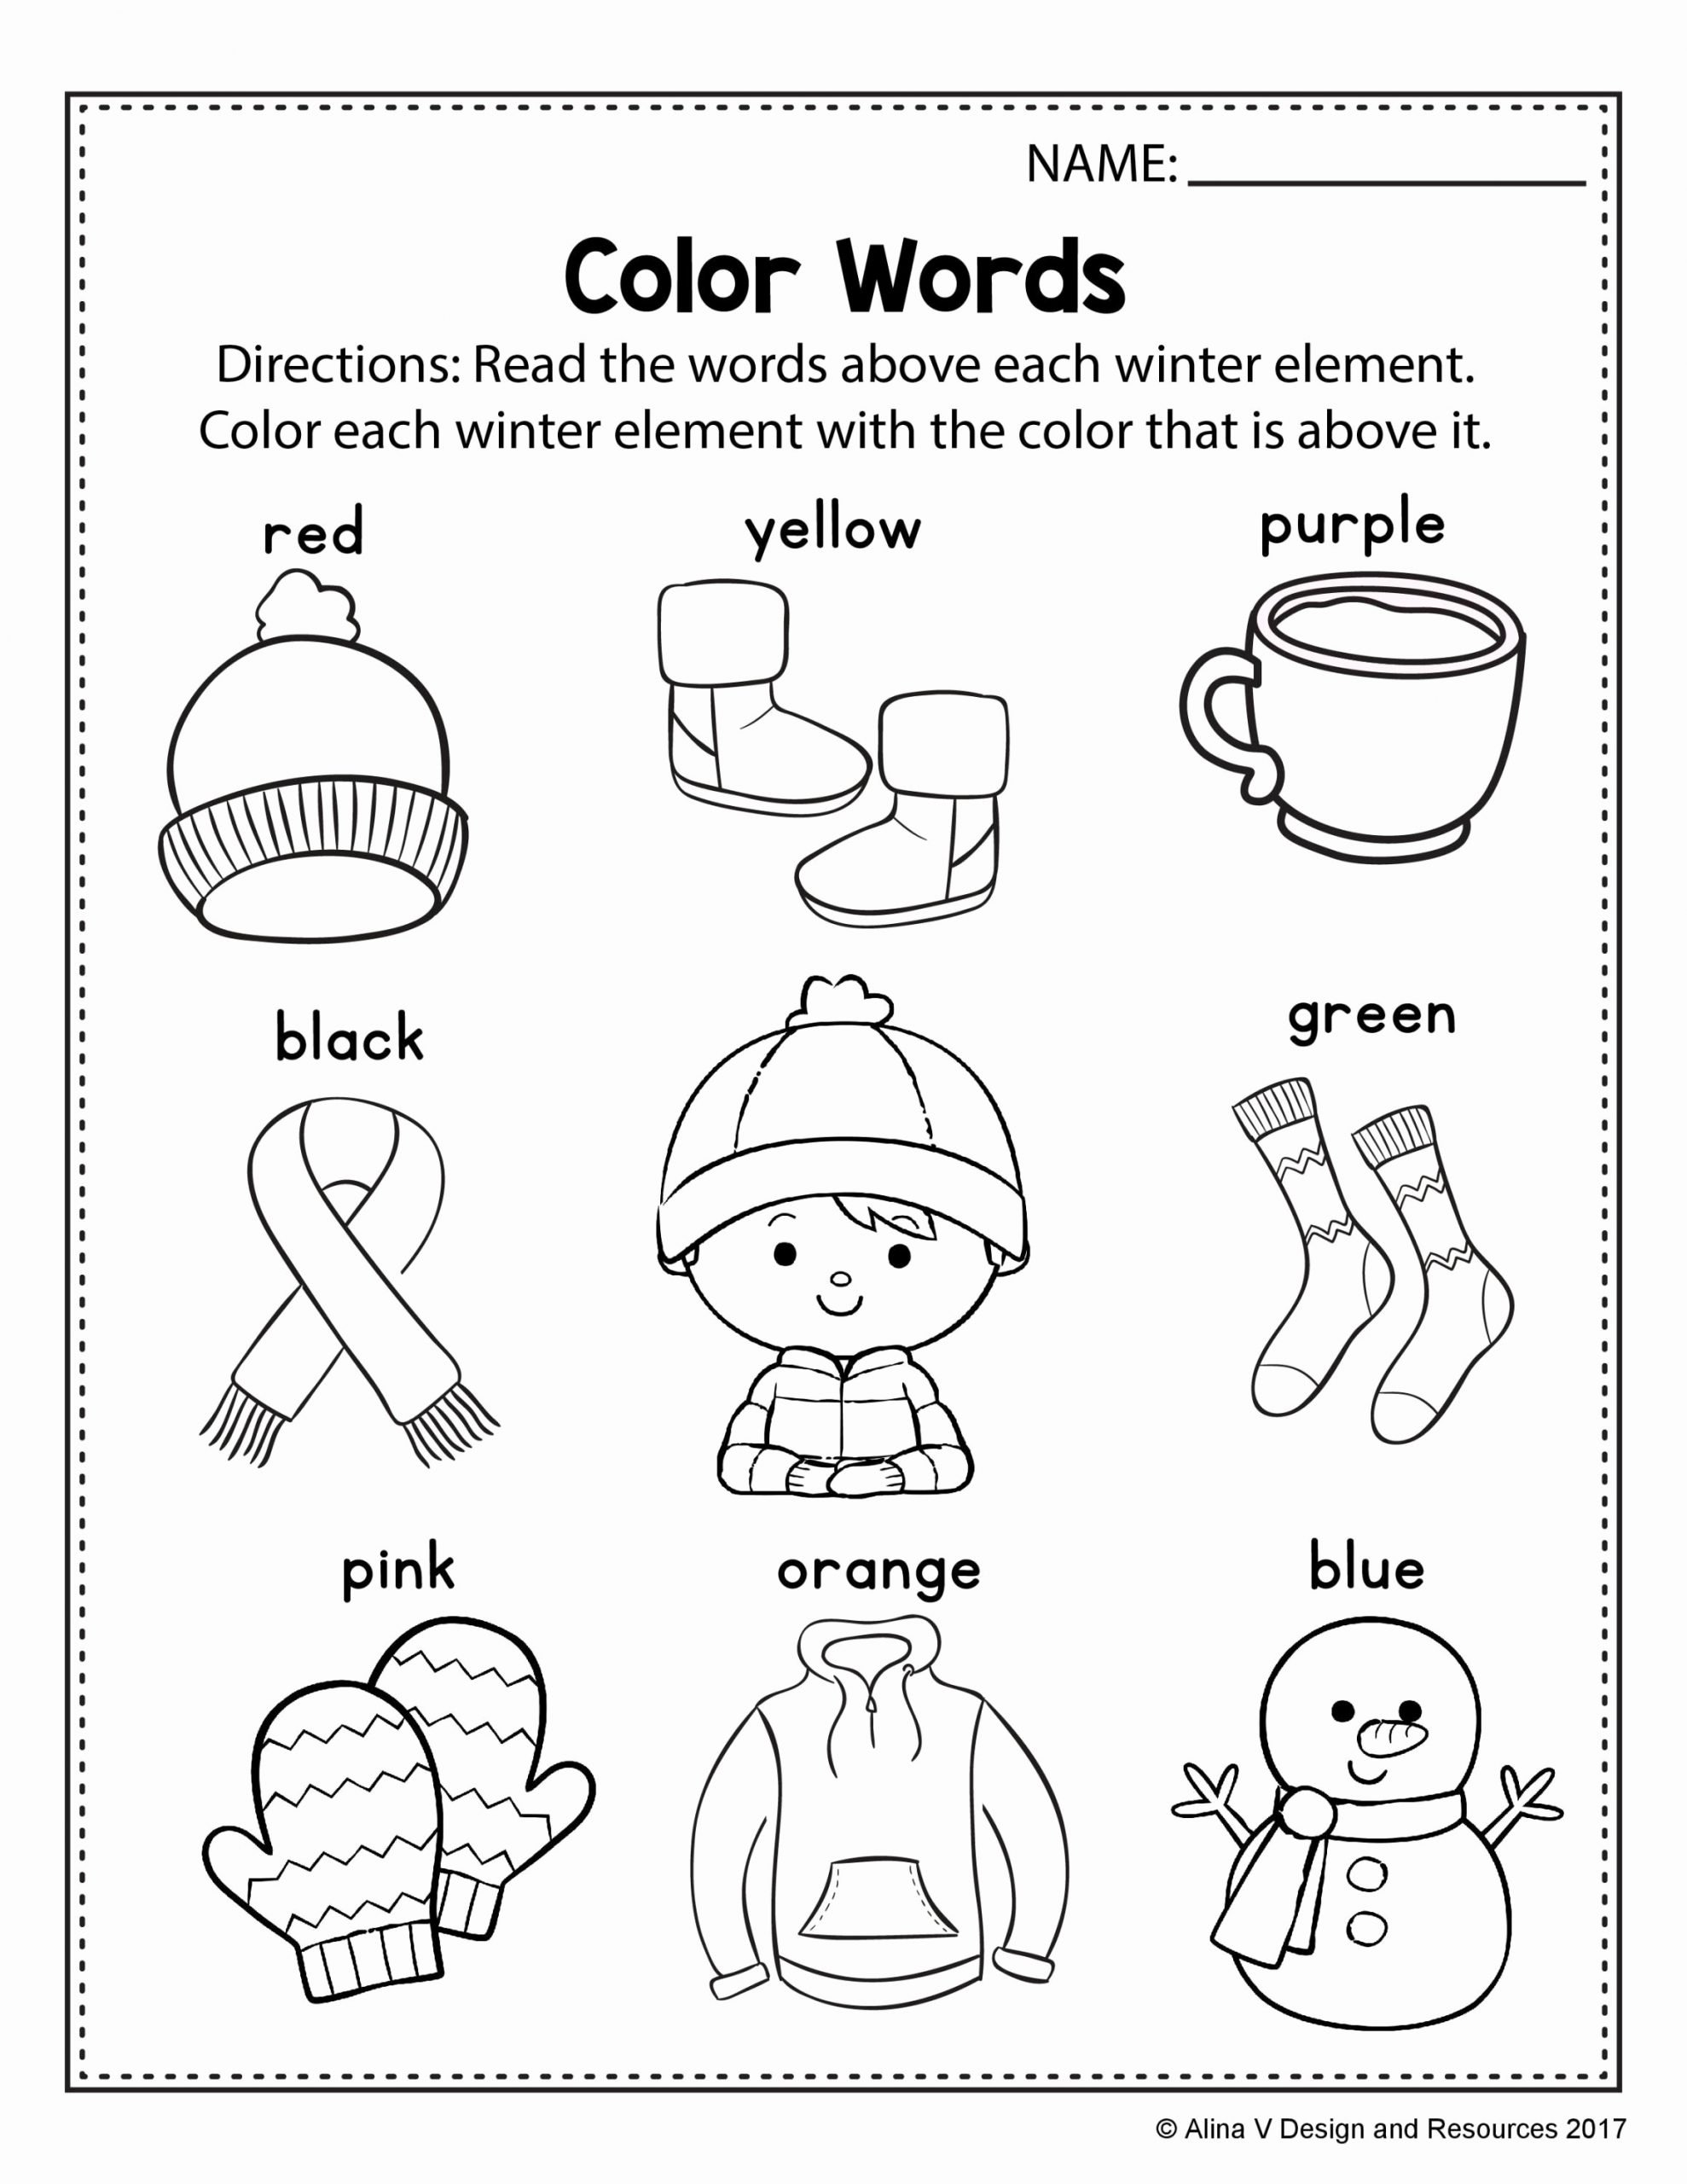 Free Printable Winter Worksheets for Preschoolers Inspirational Alinavdesign